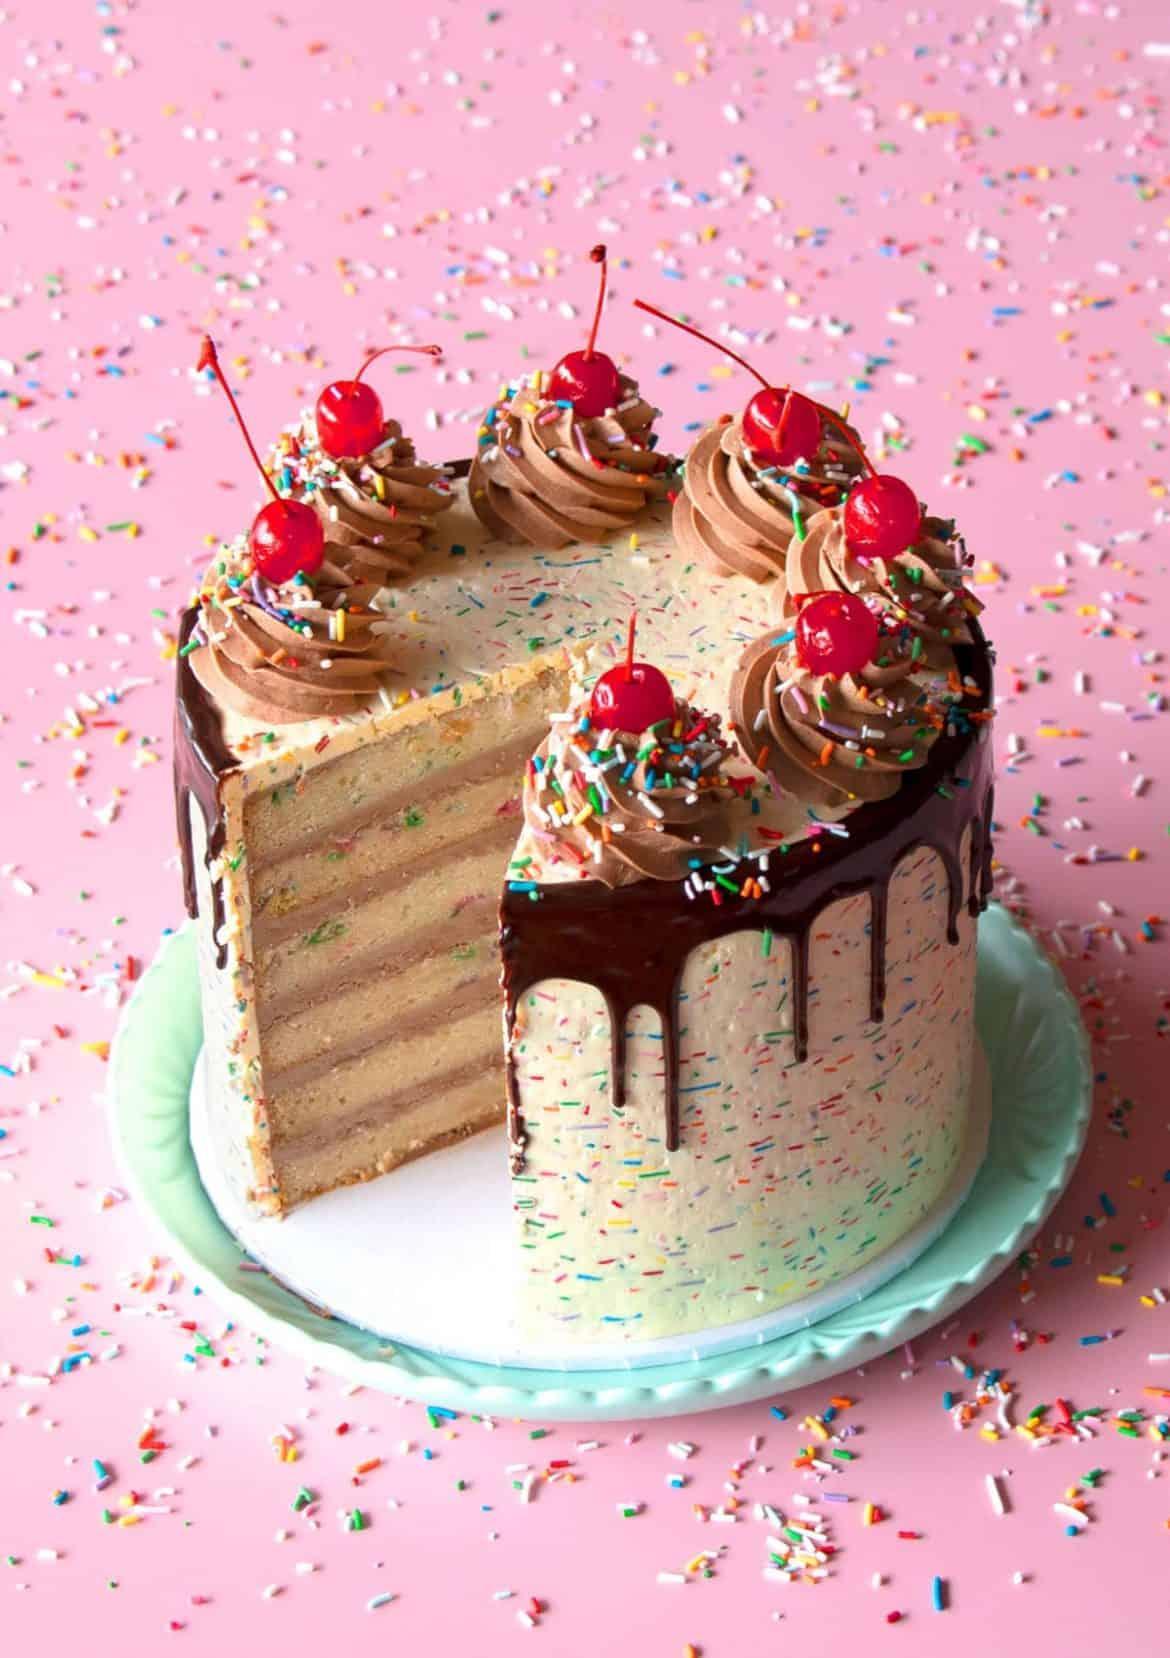 Classic Vanilla Funfetti Cake with slice taken out.